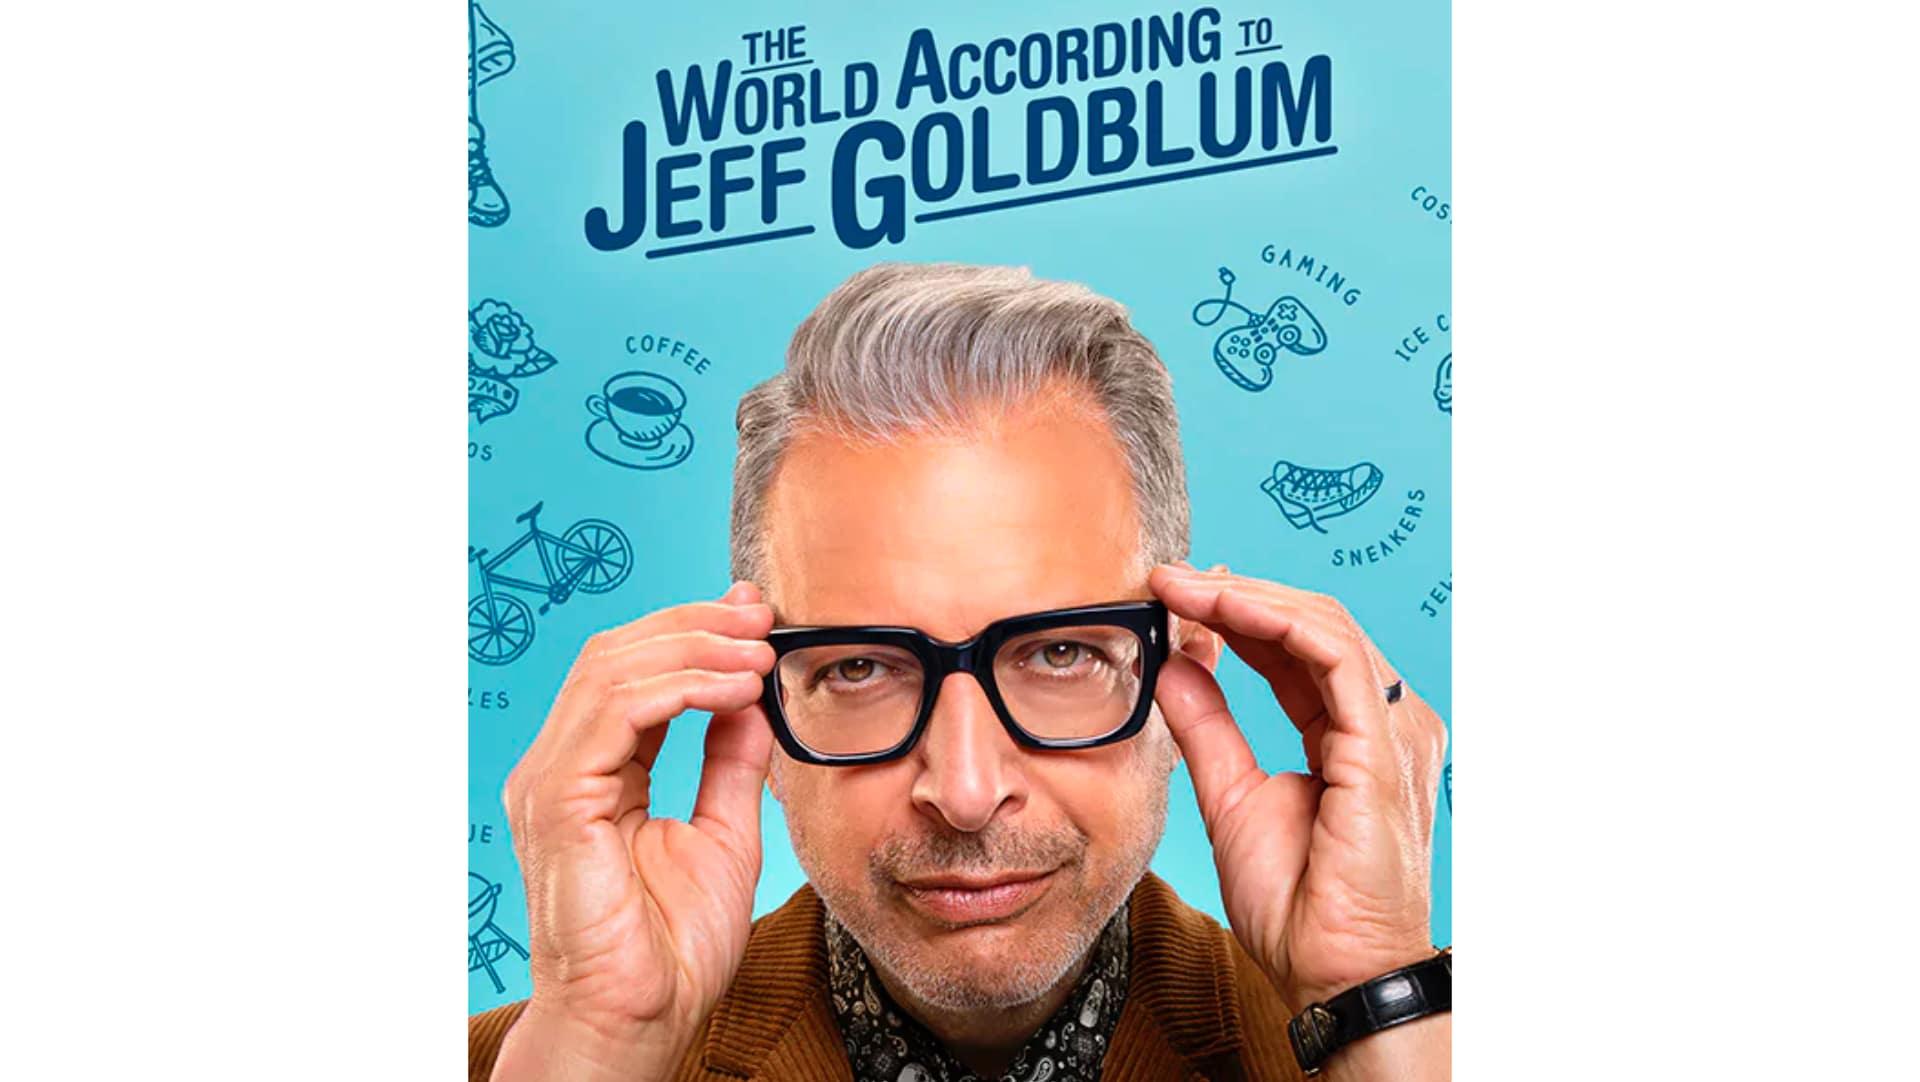 Disney Plus Original Content The world according to Jeff Goldblum